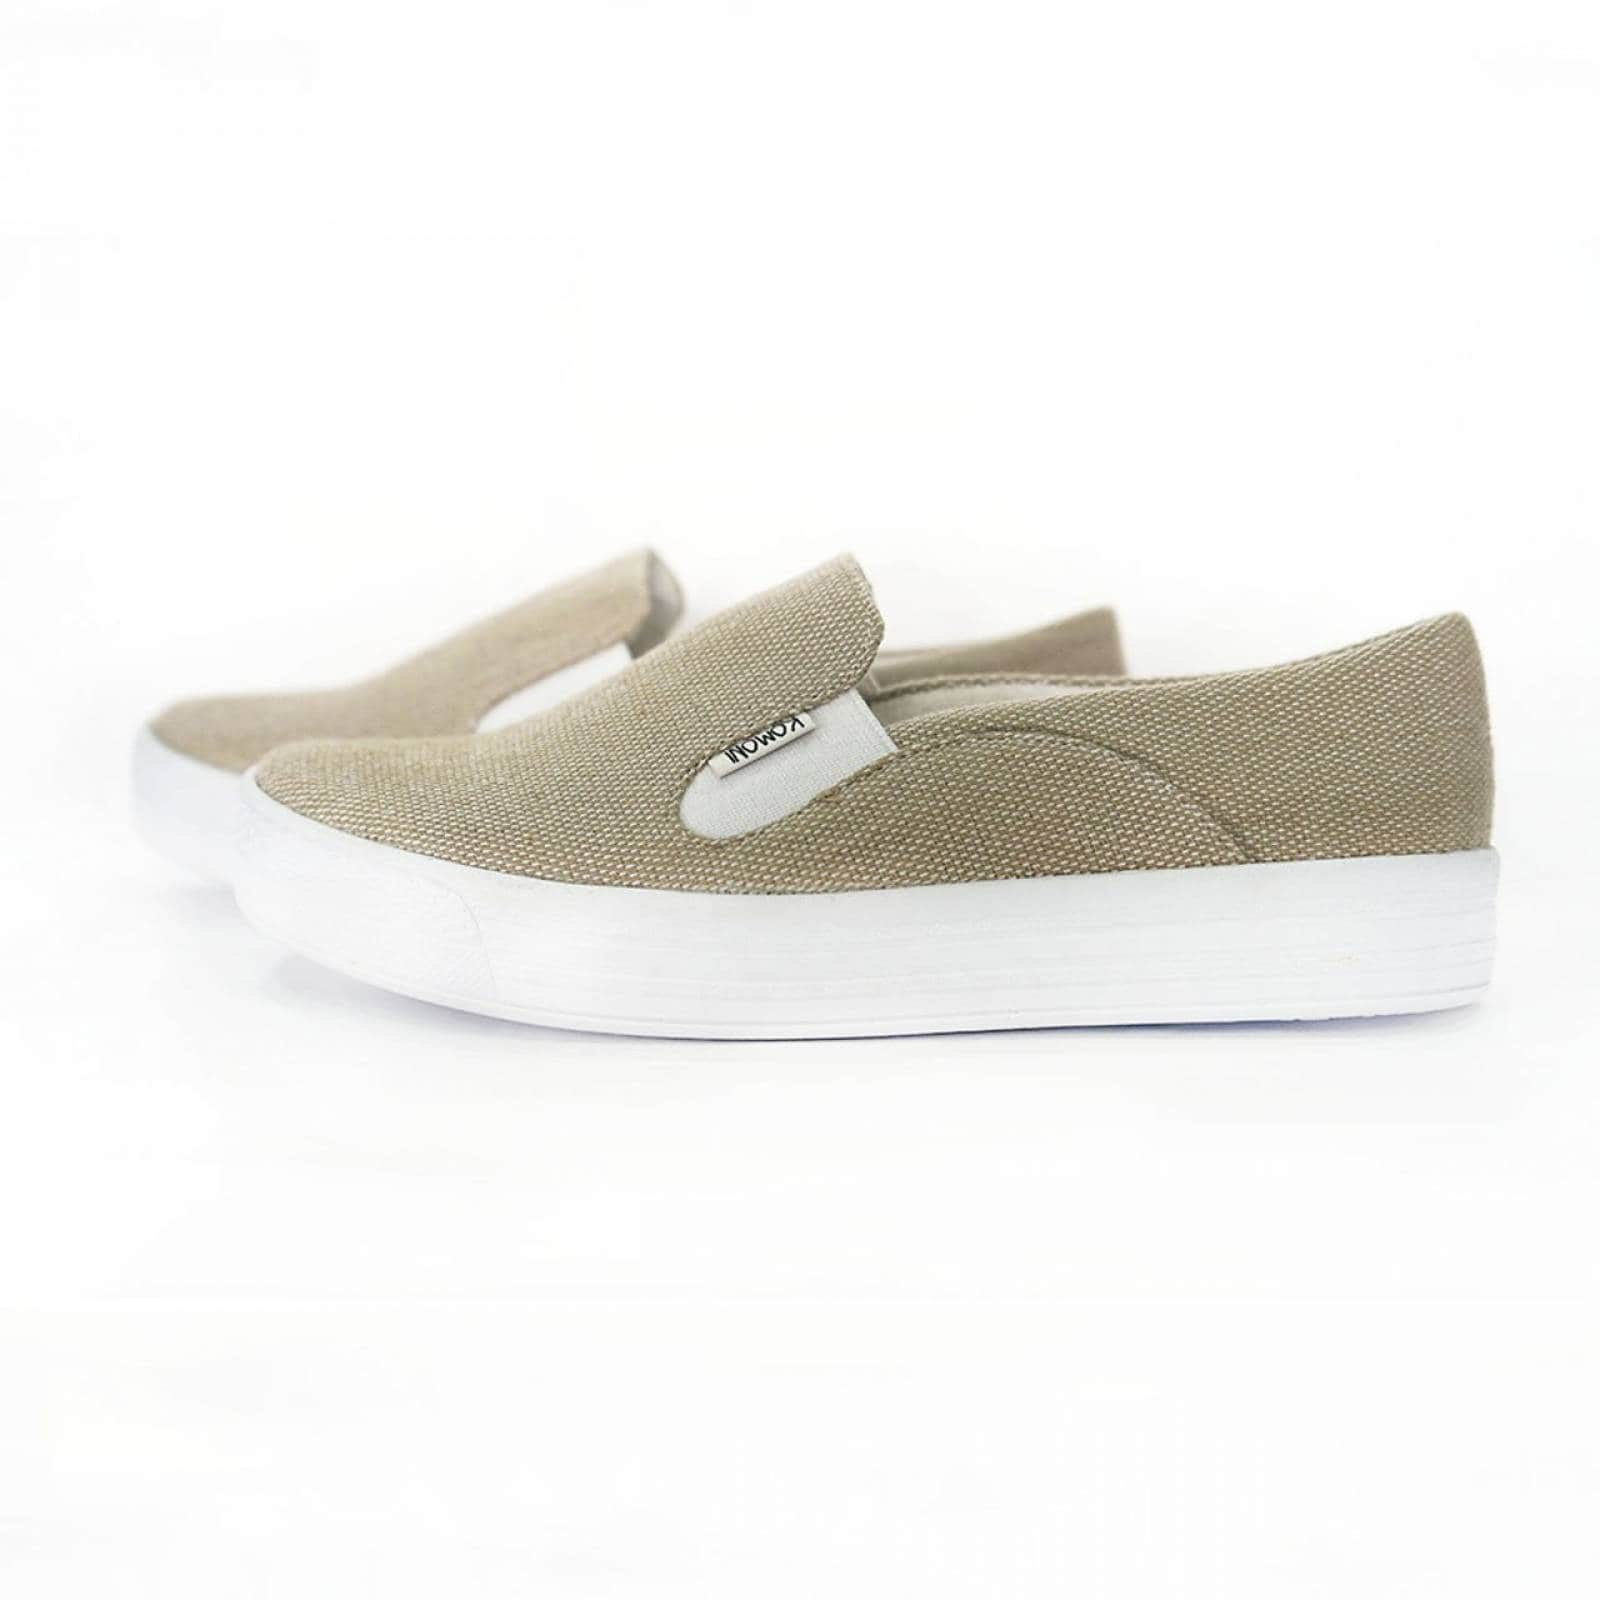 Tenis Zapato Slip On Artesanal Tela Mujer Lola Beige Komoni Talla: 25